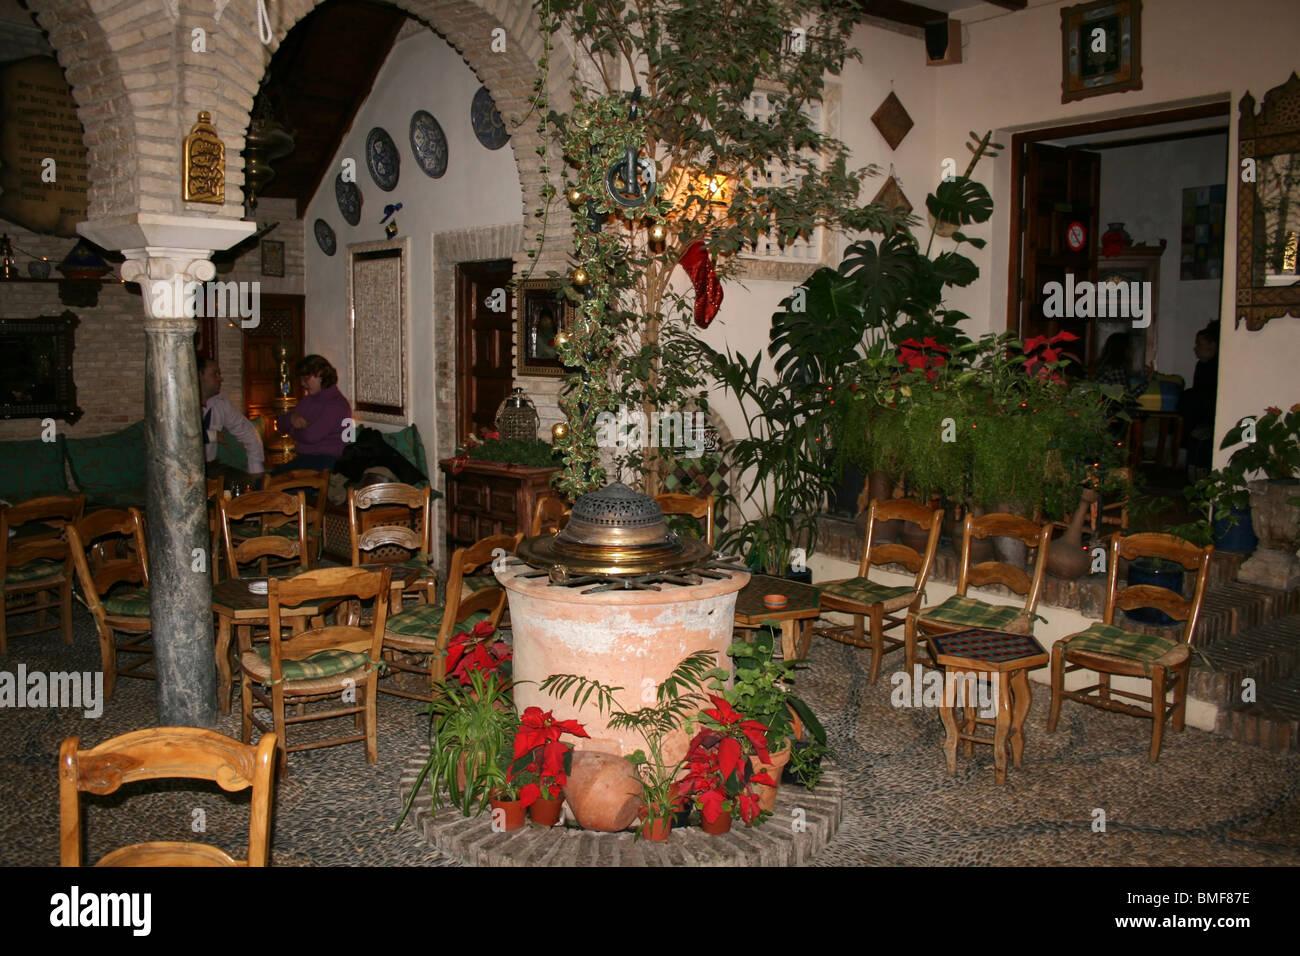 Indoor Patio Of Moroccan Style Tea House